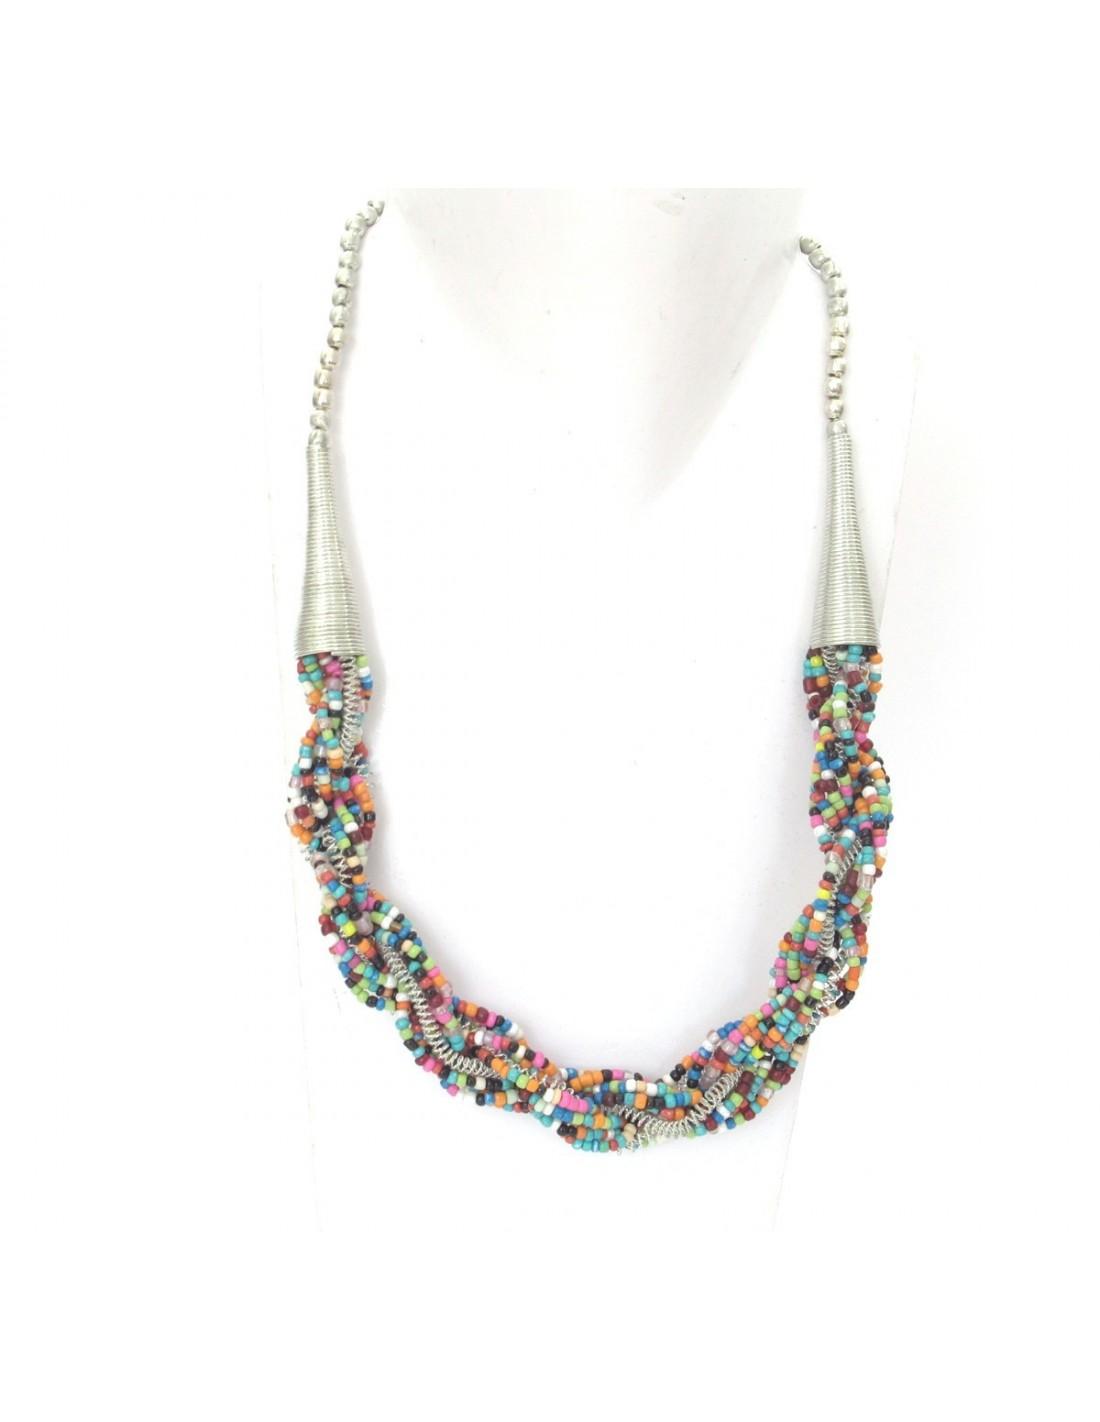 collier de perles fines torsad es bijoux et colliers indiens. Black Bedroom Furniture Sets. Home Design Ideas